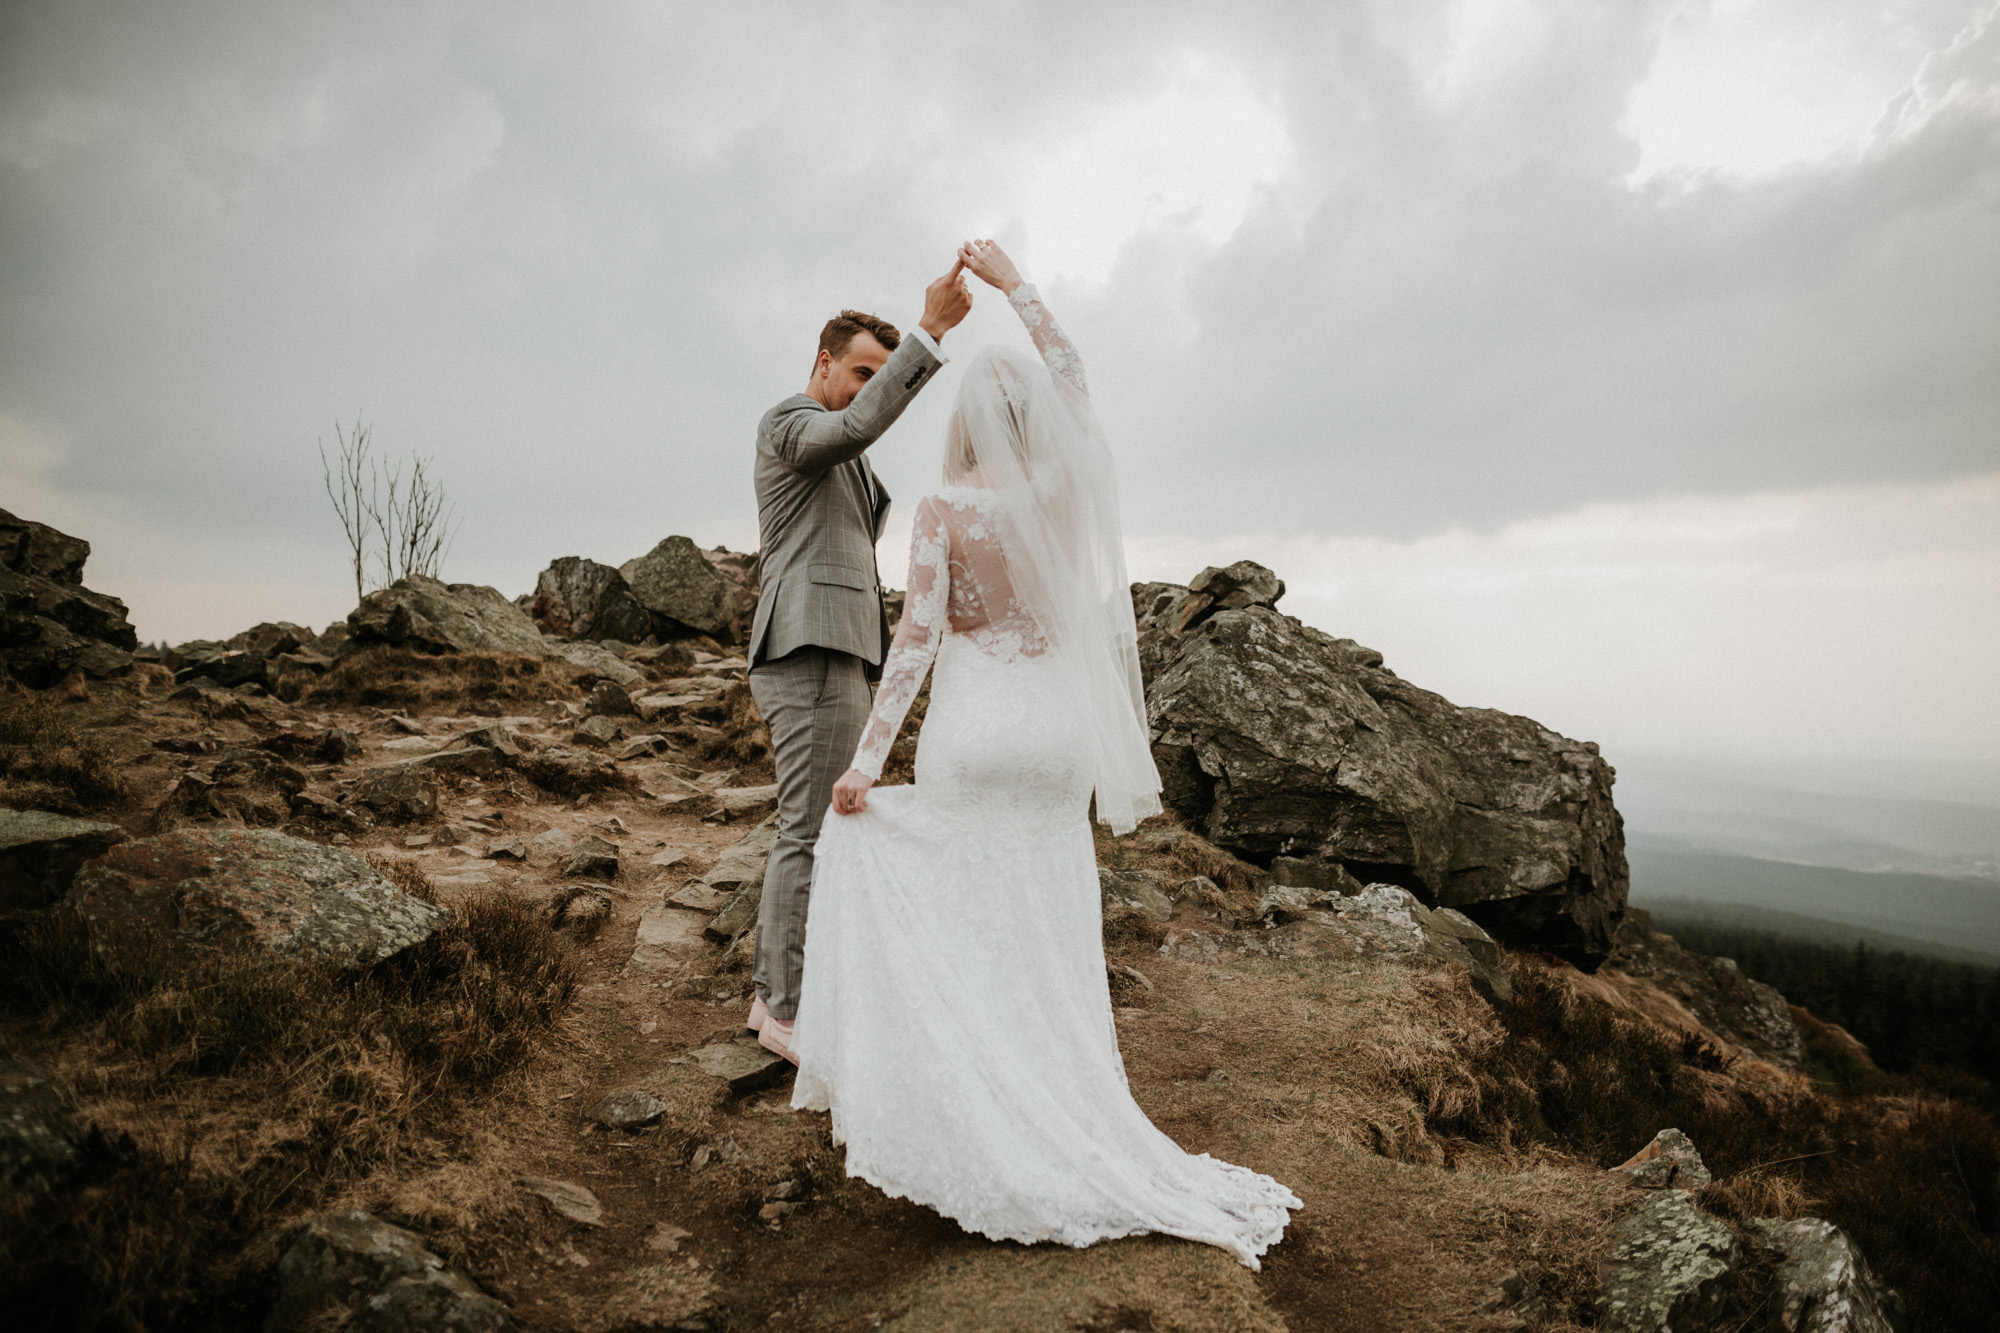 DanielaMarquardtPhotography_Hochzeitsfotograf_Düsseldorf_Köln_Mallorca_Bayern_Austria_Harz_LinaundMaik_Afterwedding-Shooting_Weddingphotographer_Ibiza_Tuskany_Italien_Toskana48